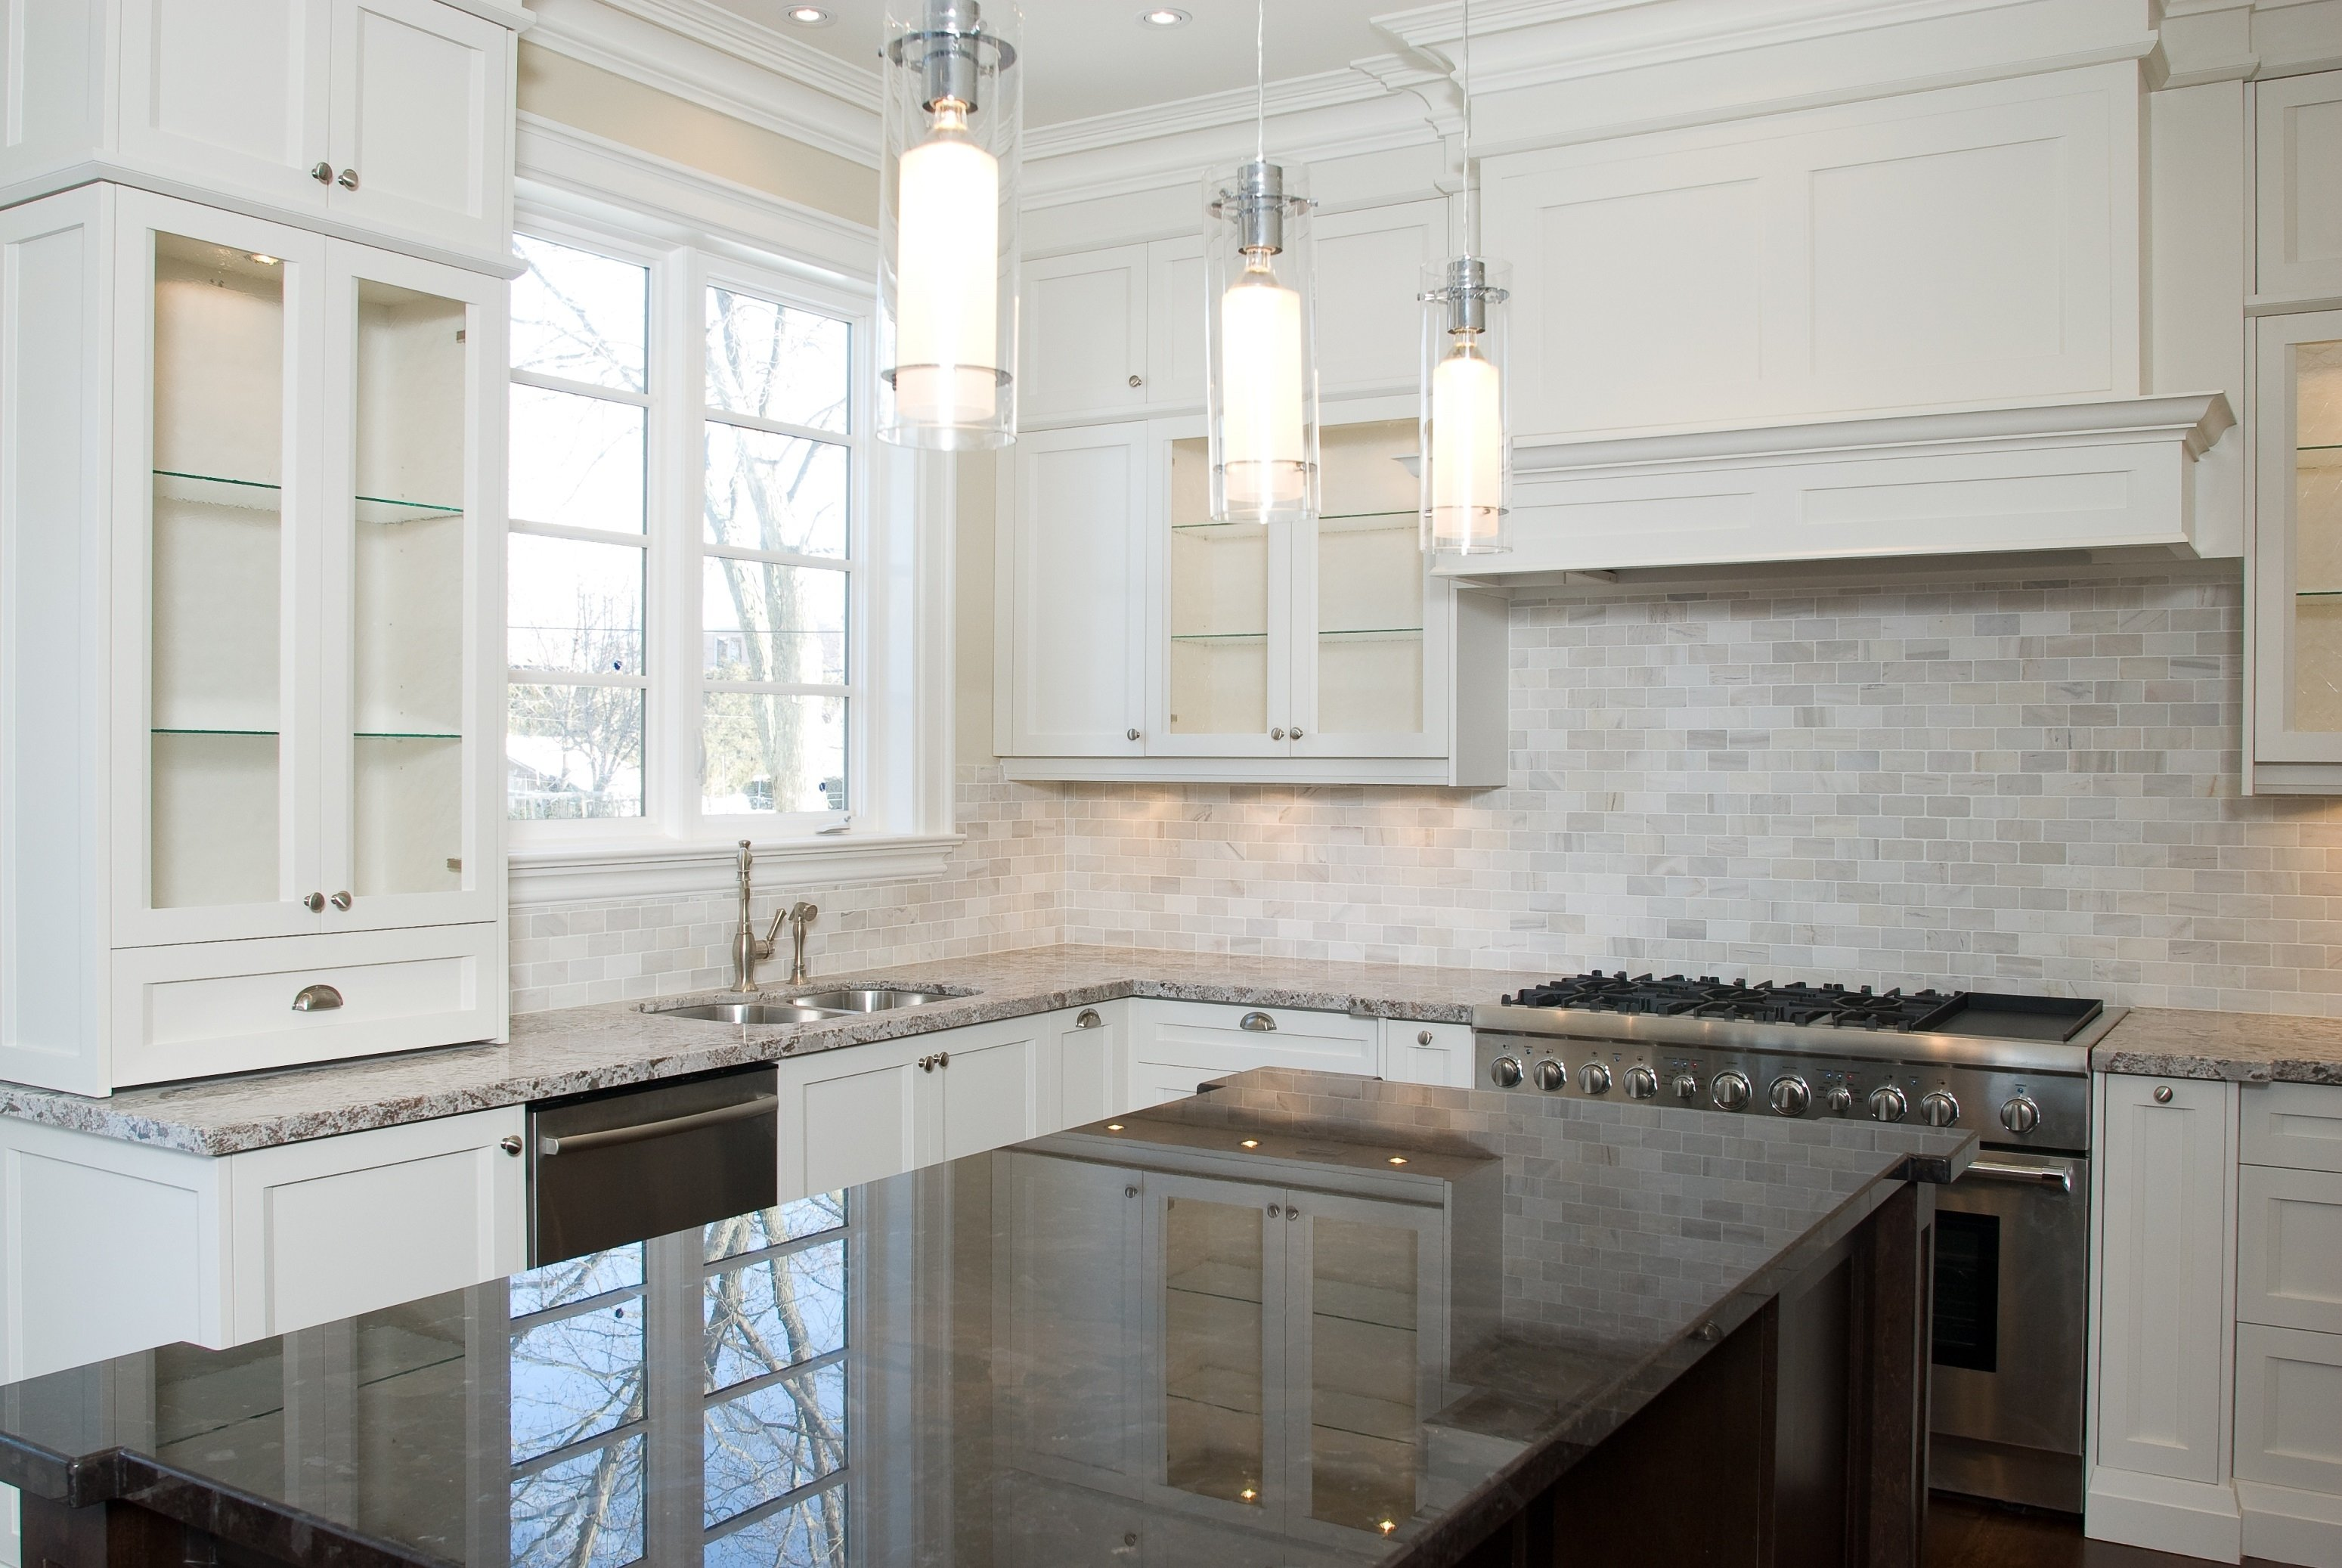 10 Unique Backsplash Ideas For White Cabinets copy cool kitchen backsplash ideas e280a2 kitchen backsplash new 2021